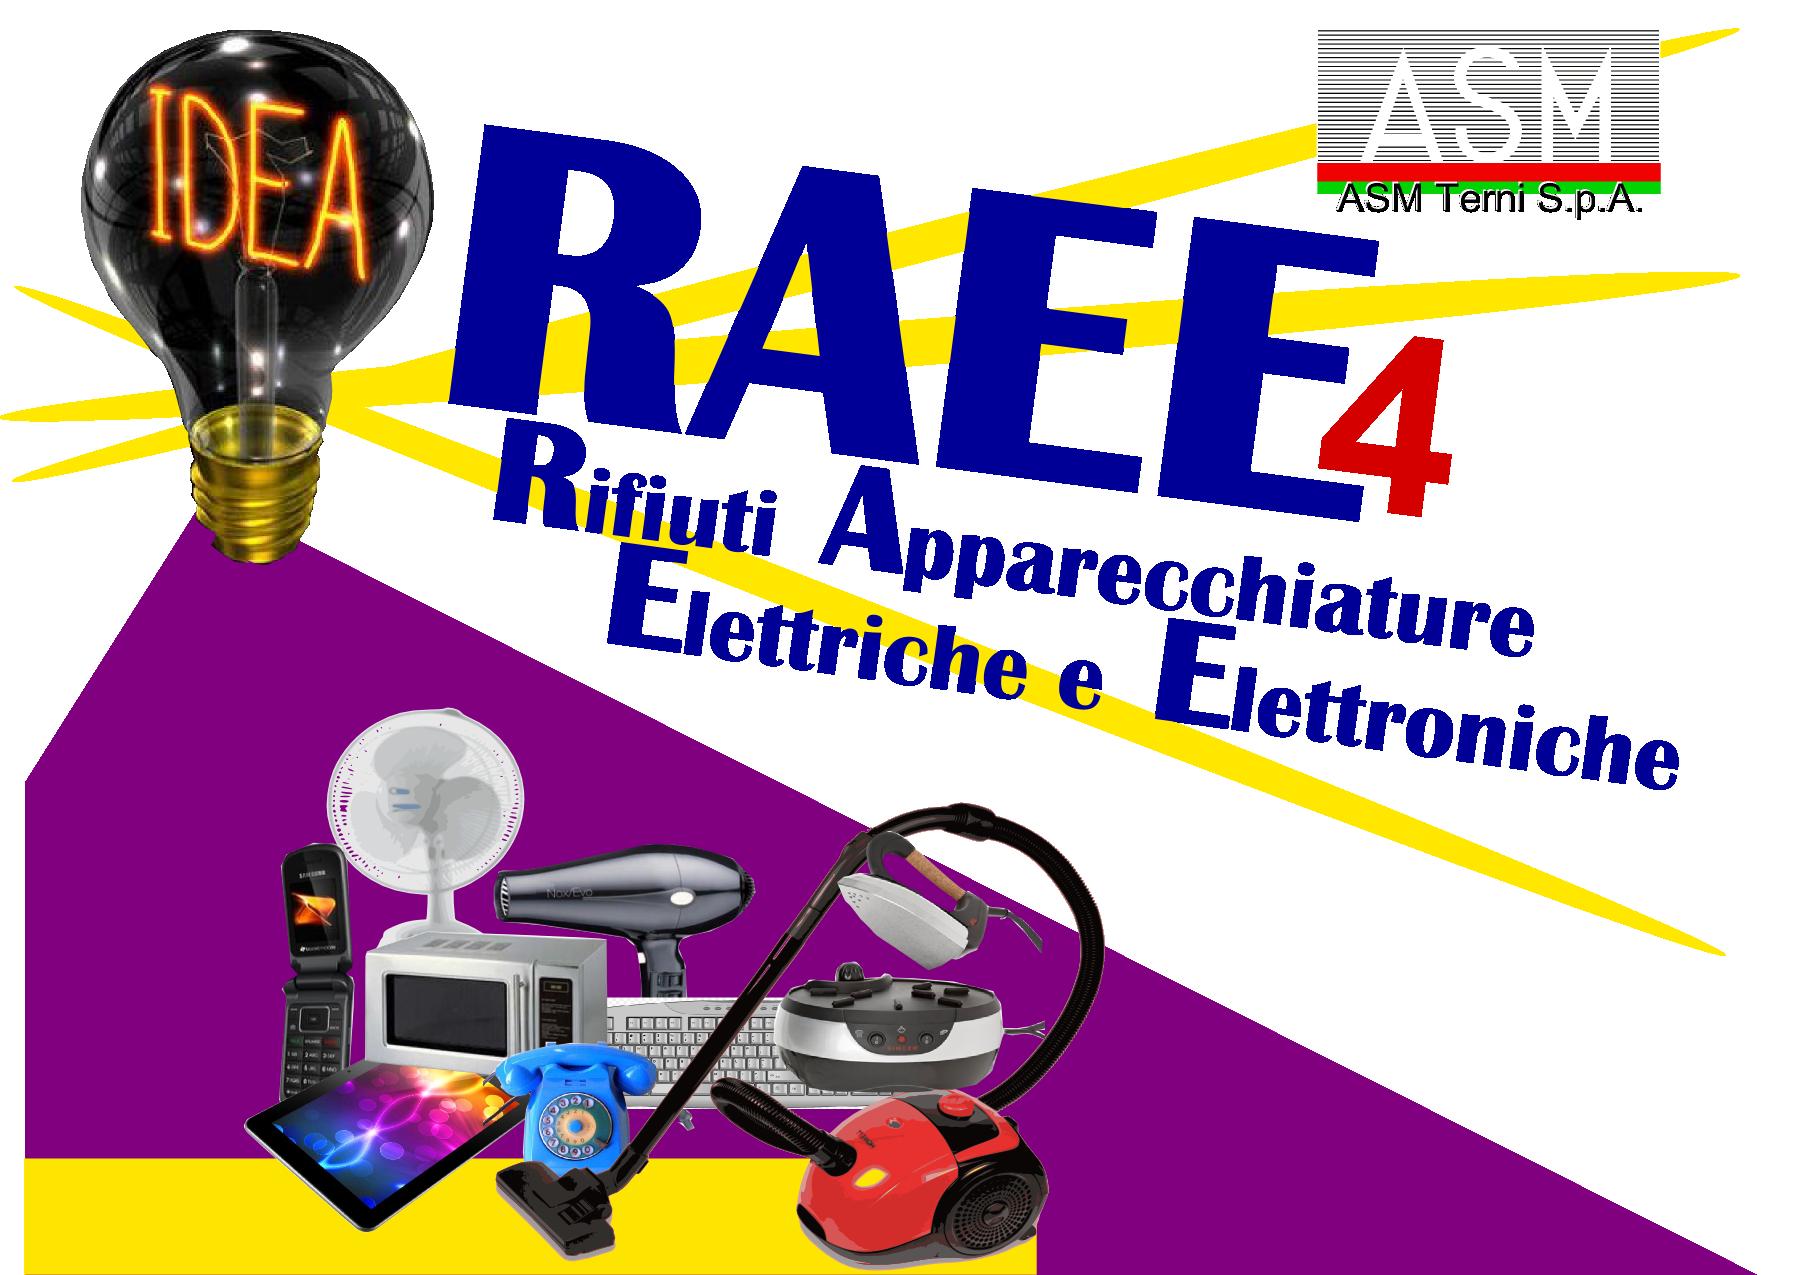 RAEE4_1